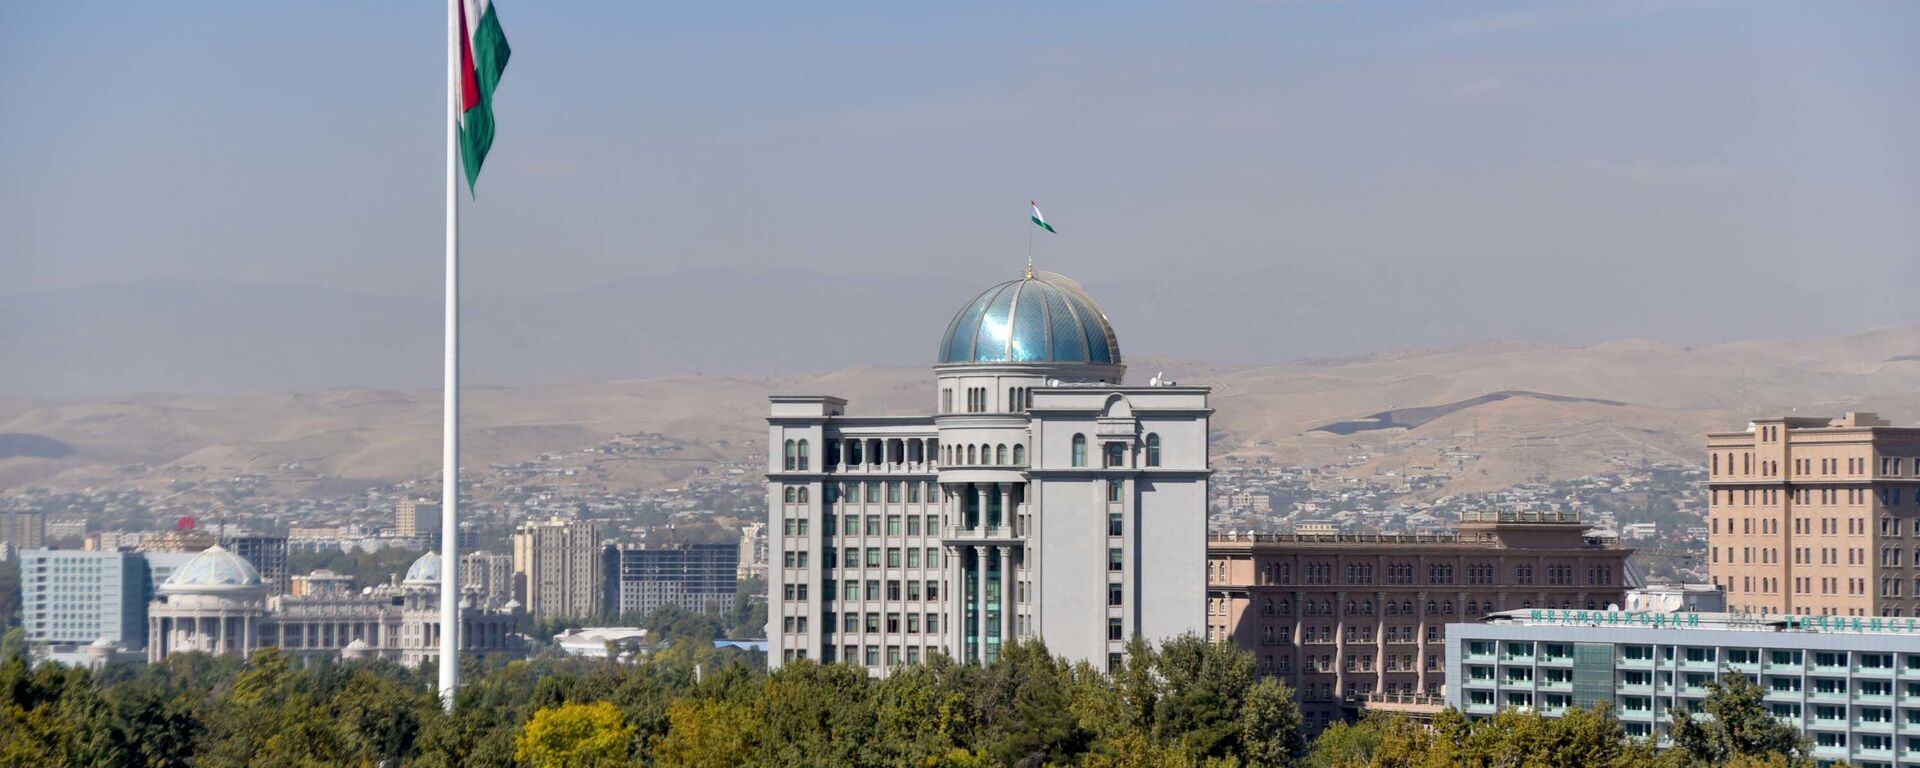 Город Душанбе - Sputnik Таджикистан, 1920, 17.09.2021